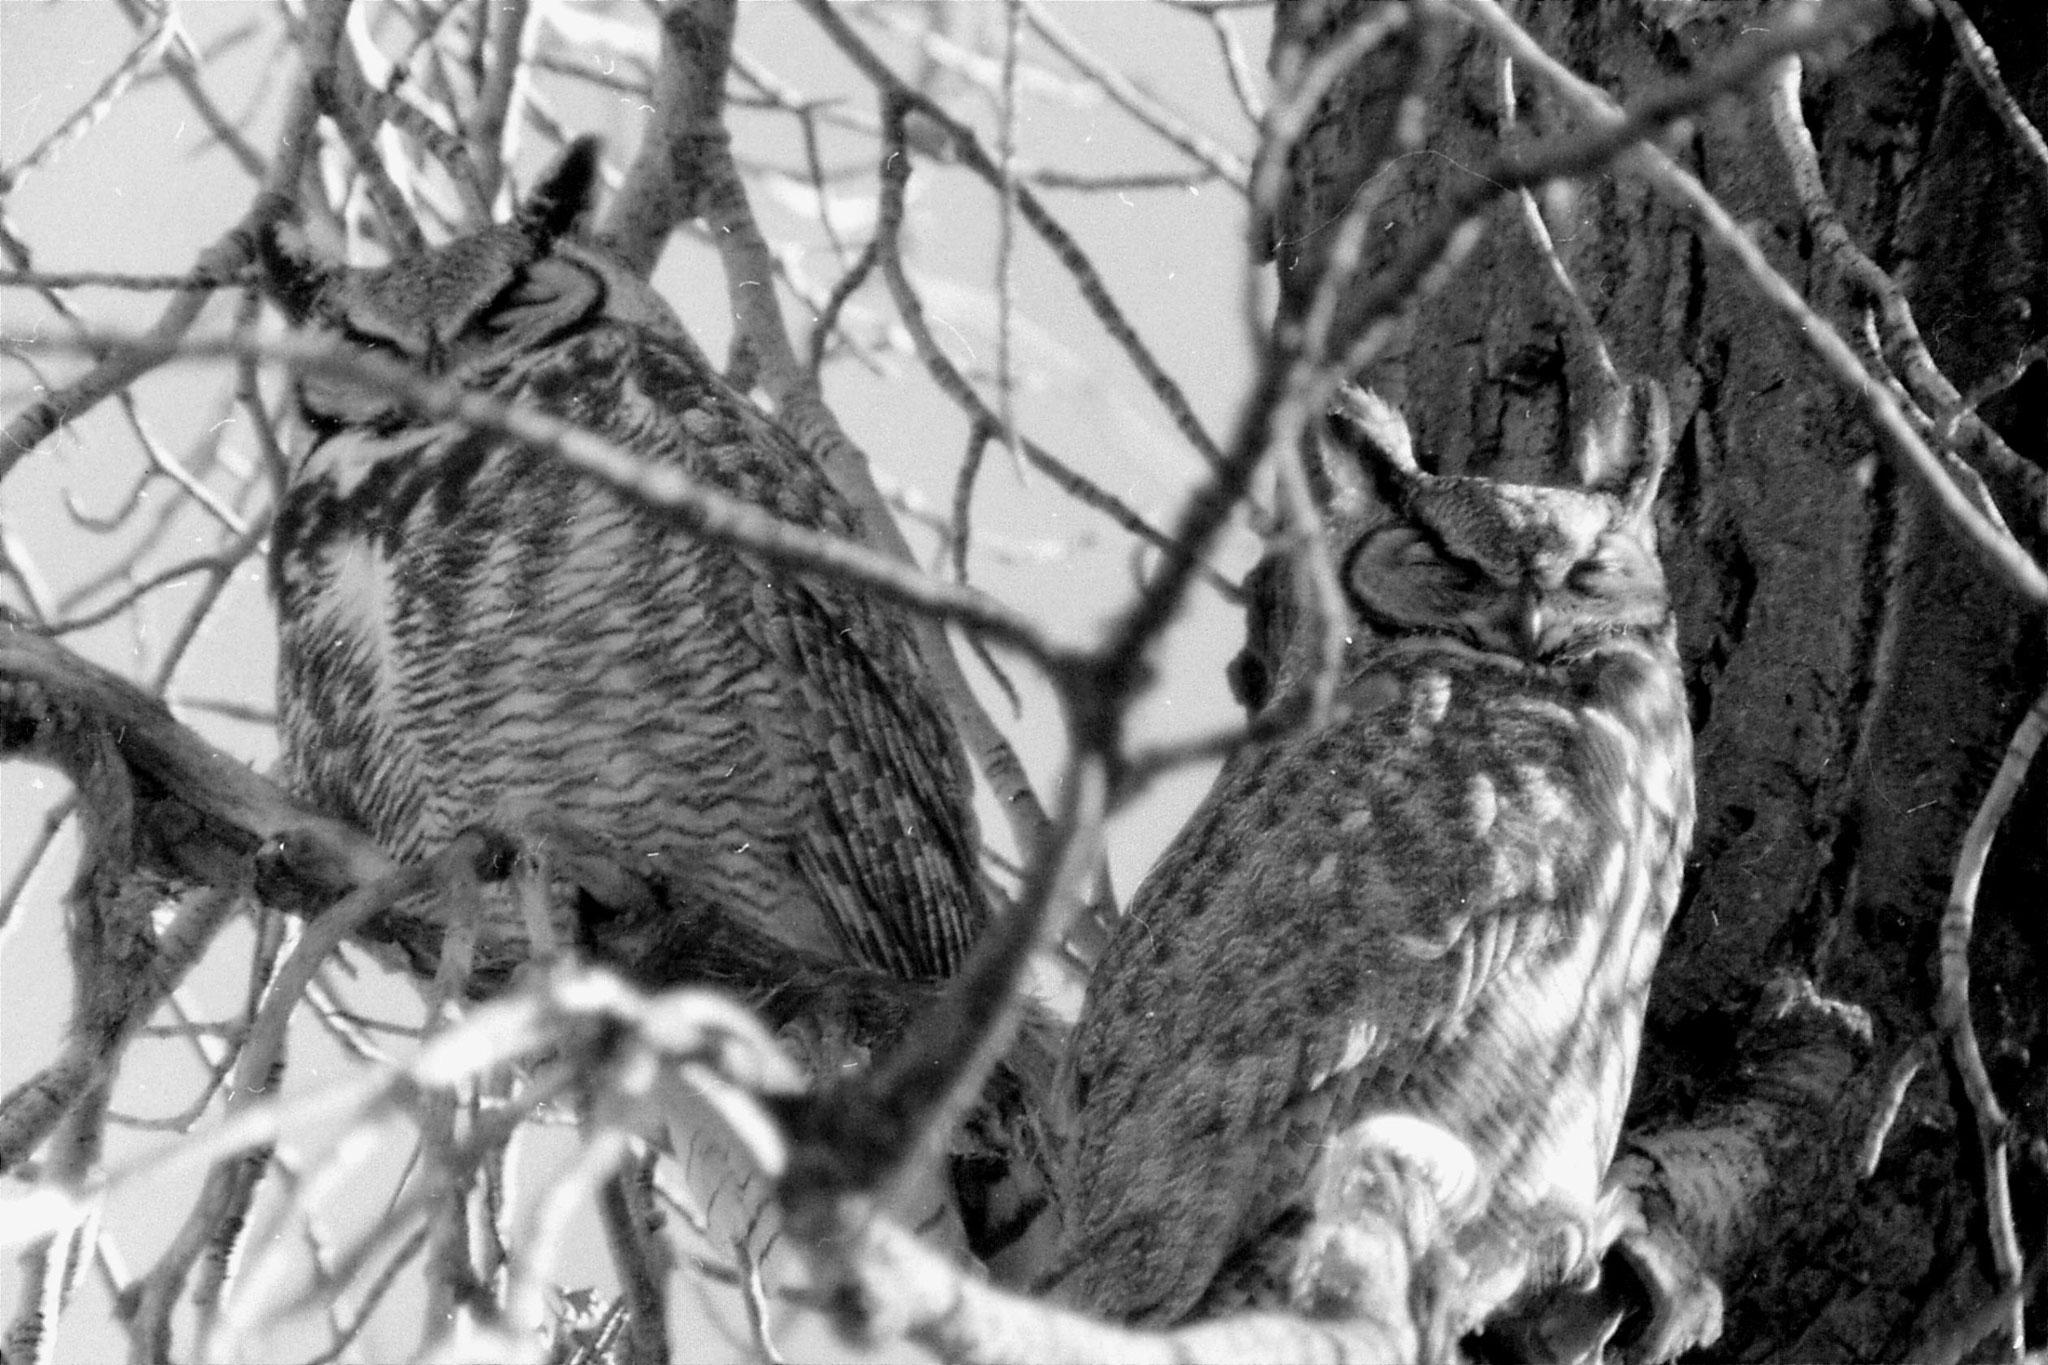 23/1/1991: 6: Gt Horned Owls